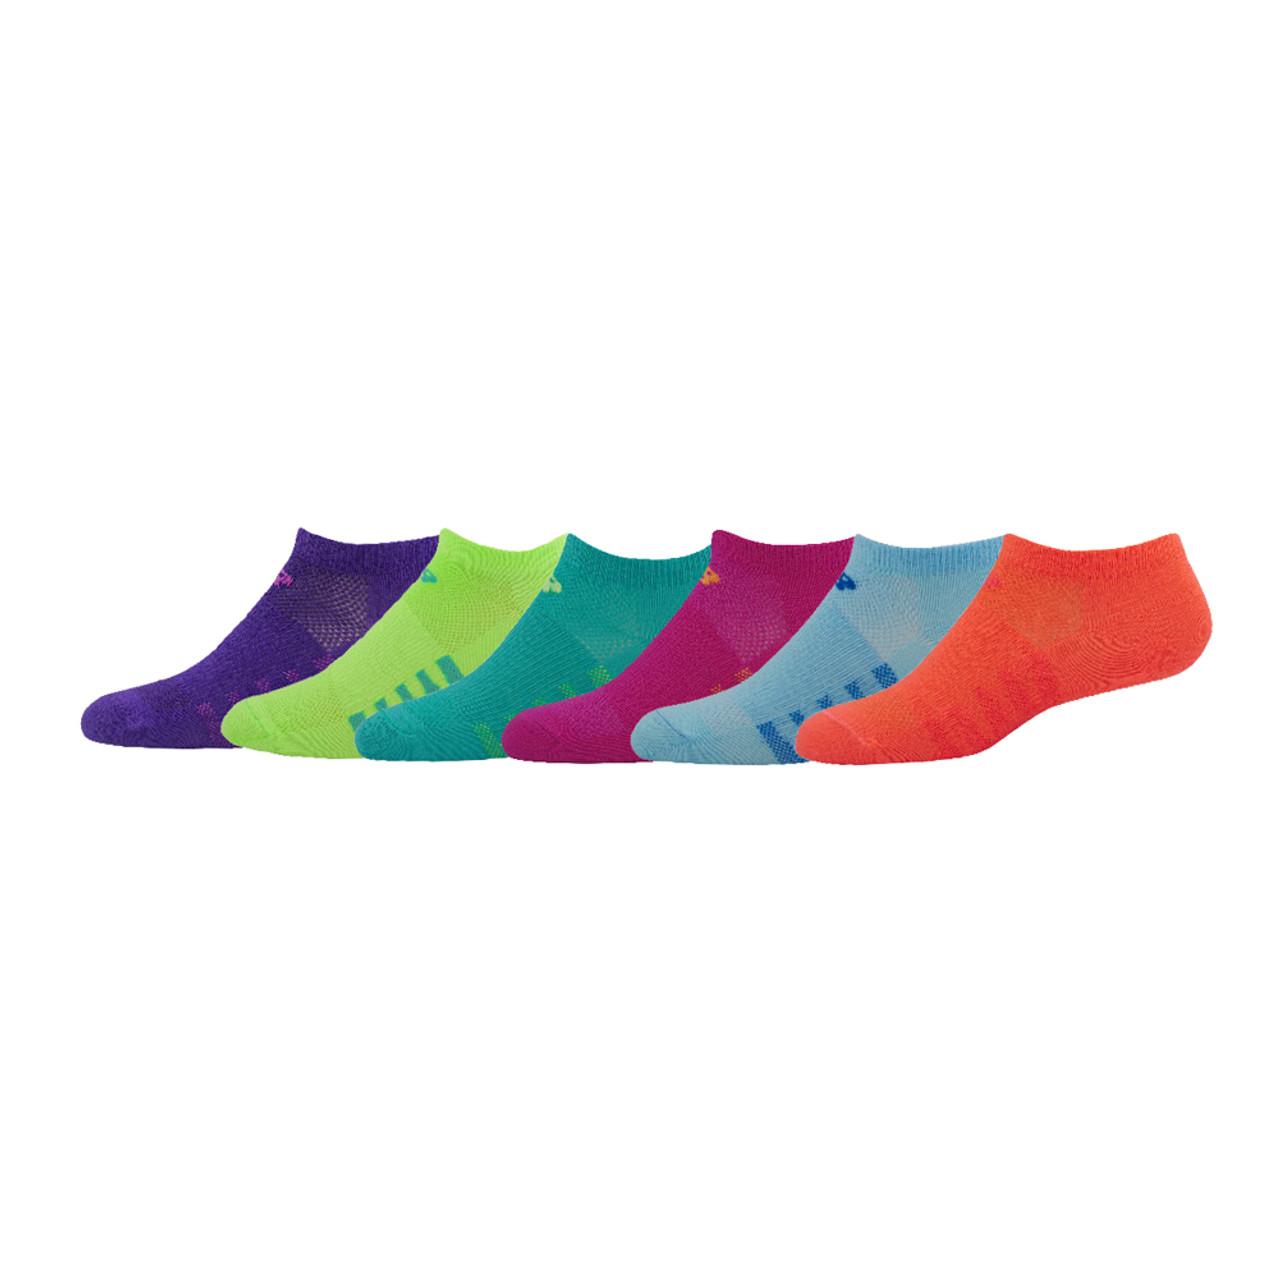 3b4a0effd8587 New Balance Youth Unisex 6 Pack No Show Socks Assortment - Shop now @  Shoolu.